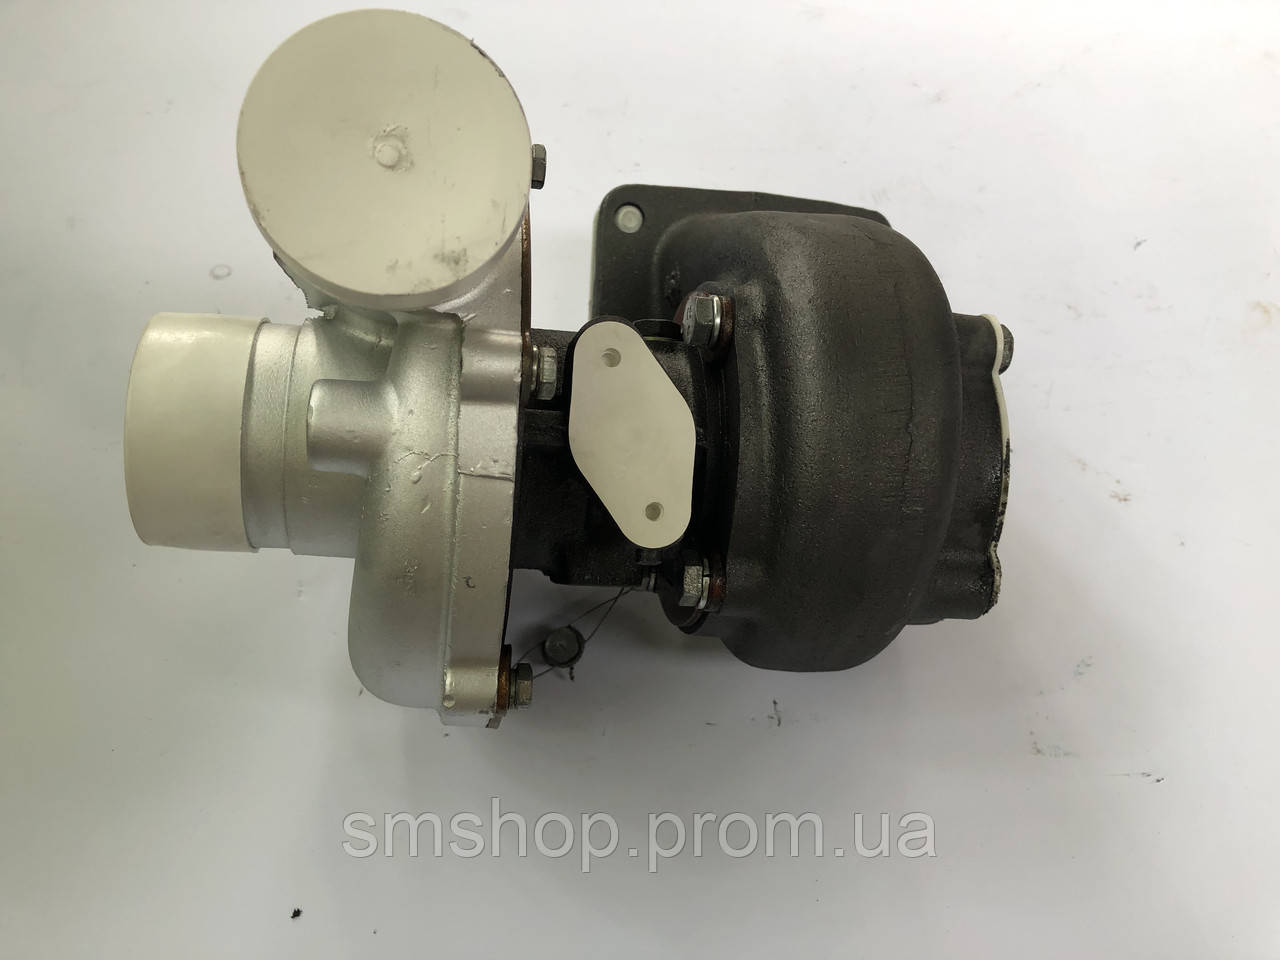 Турбокомпрессор (турбина) ТКР-6 (МТЗ, ЮМЗ, Зил Бычок, ГАЗ, ПАЗ)